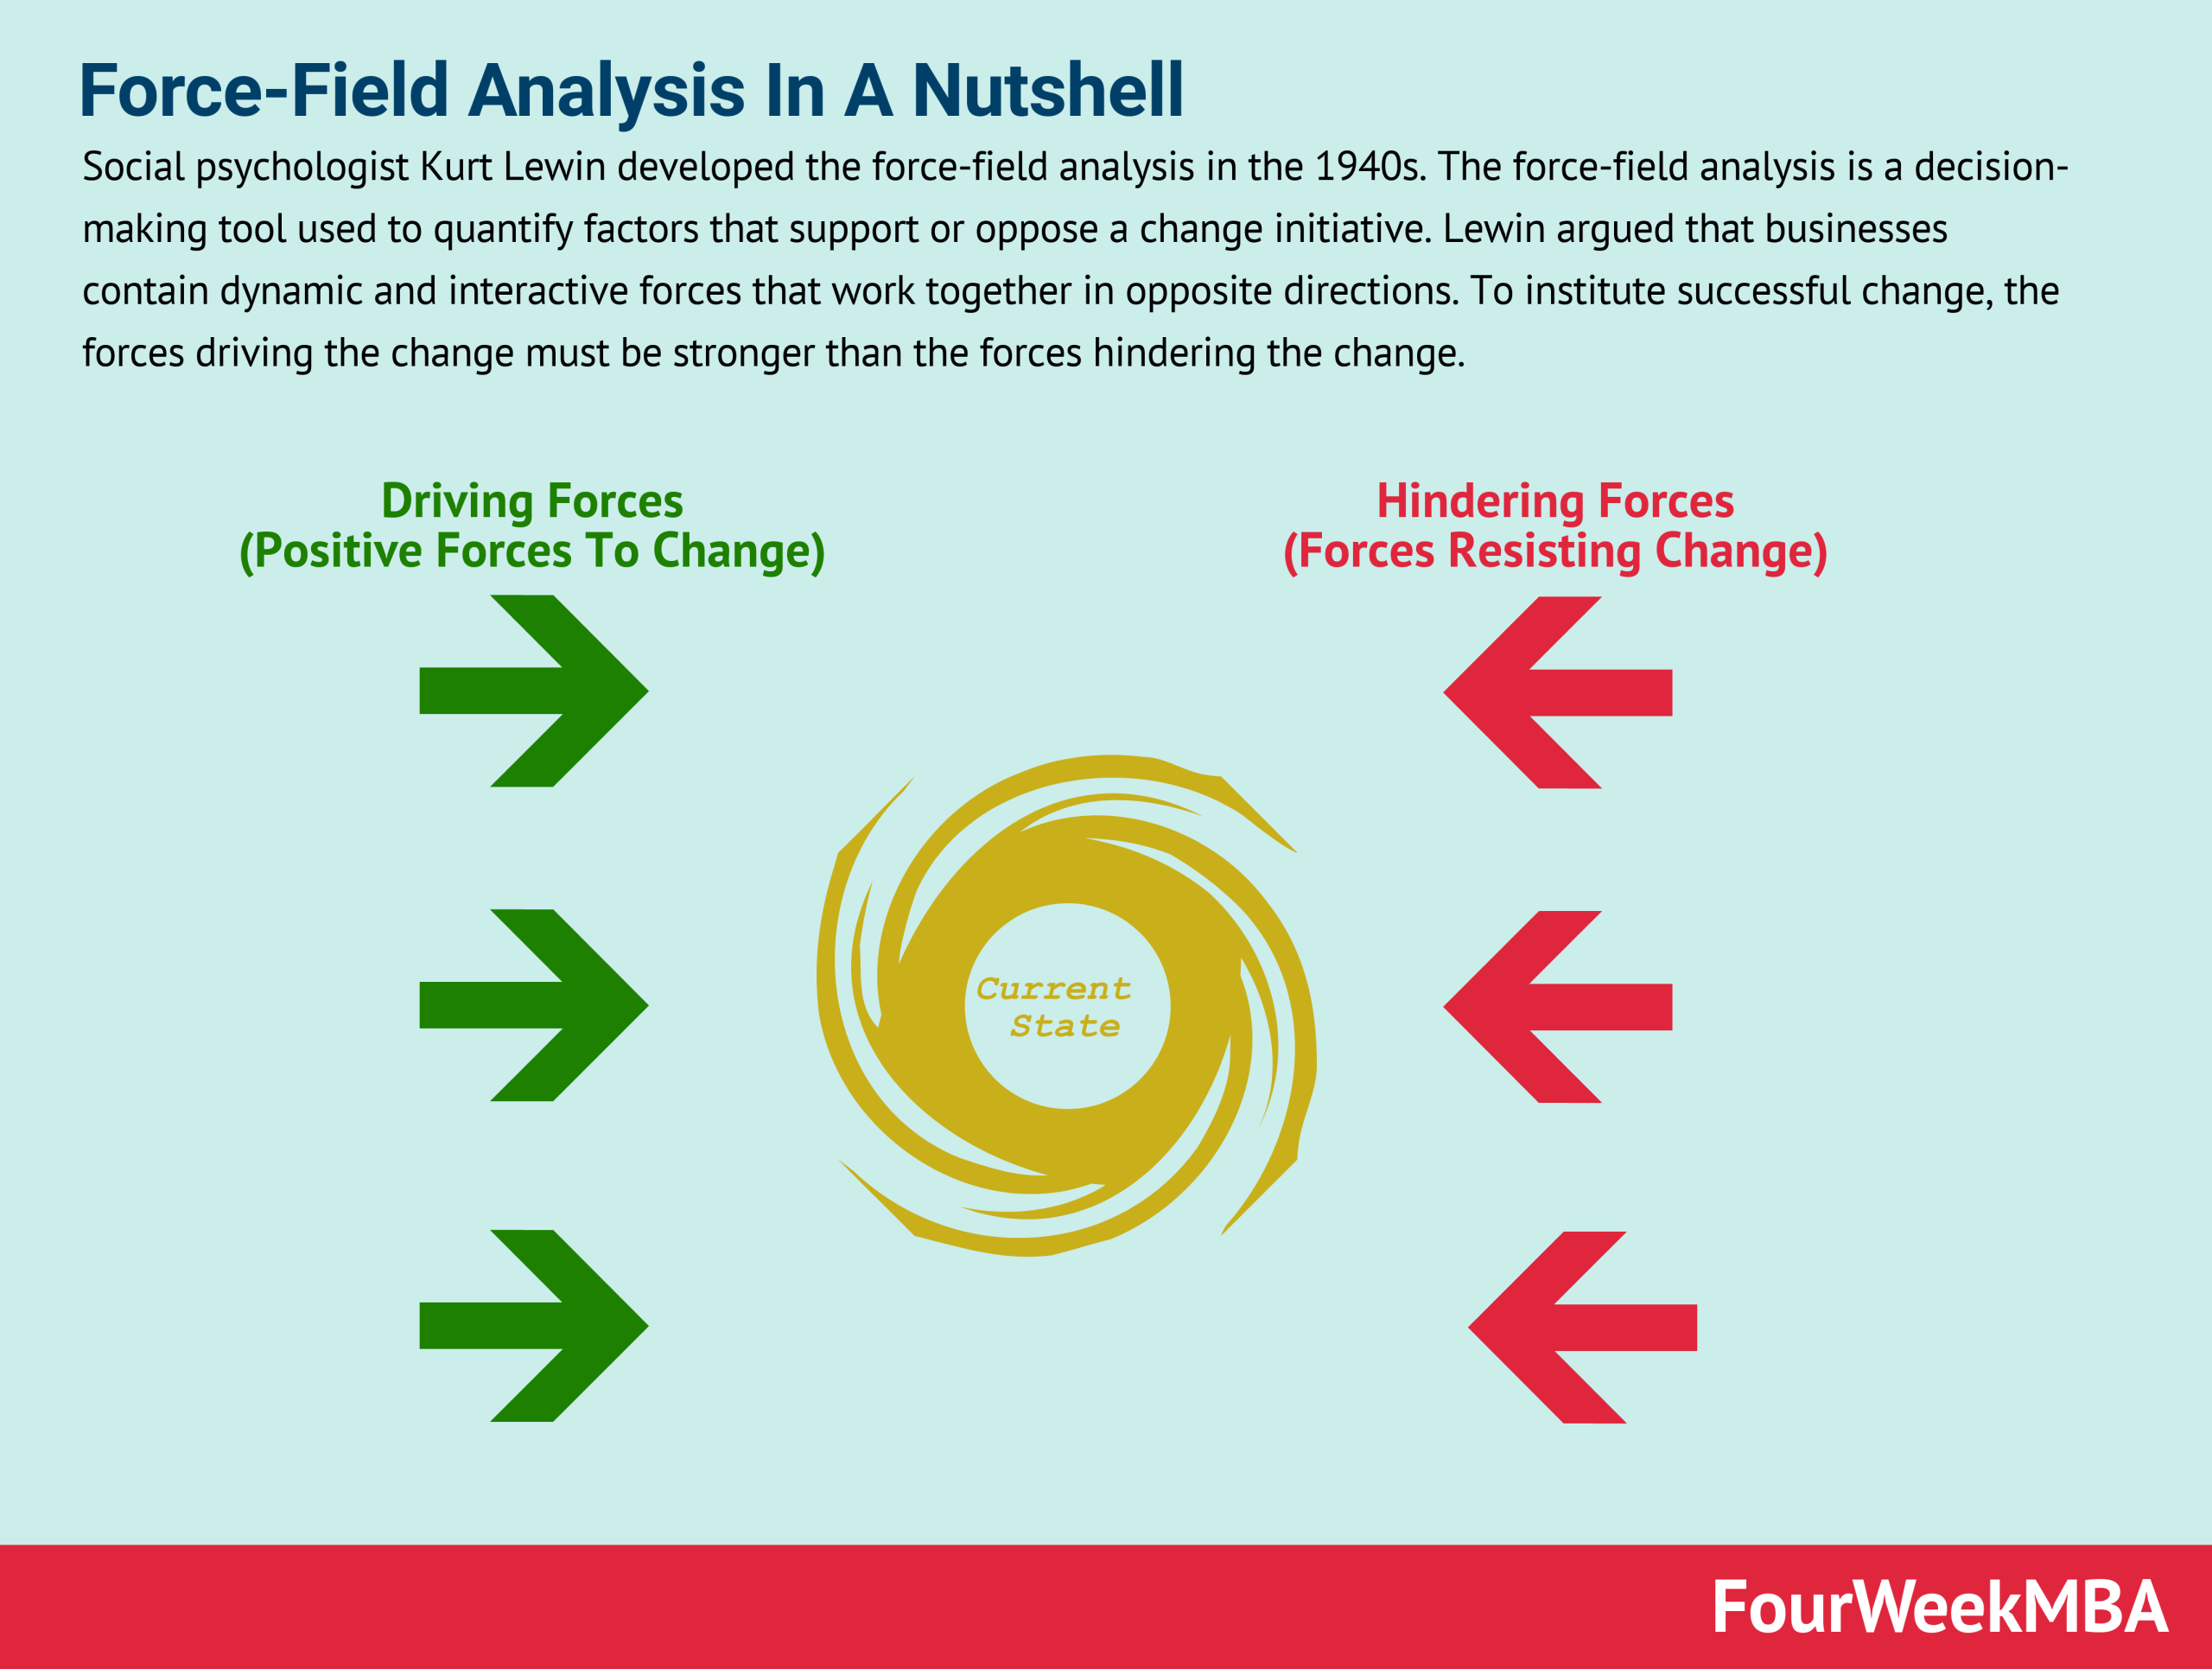 Force-Field Analysis In A Nutshell